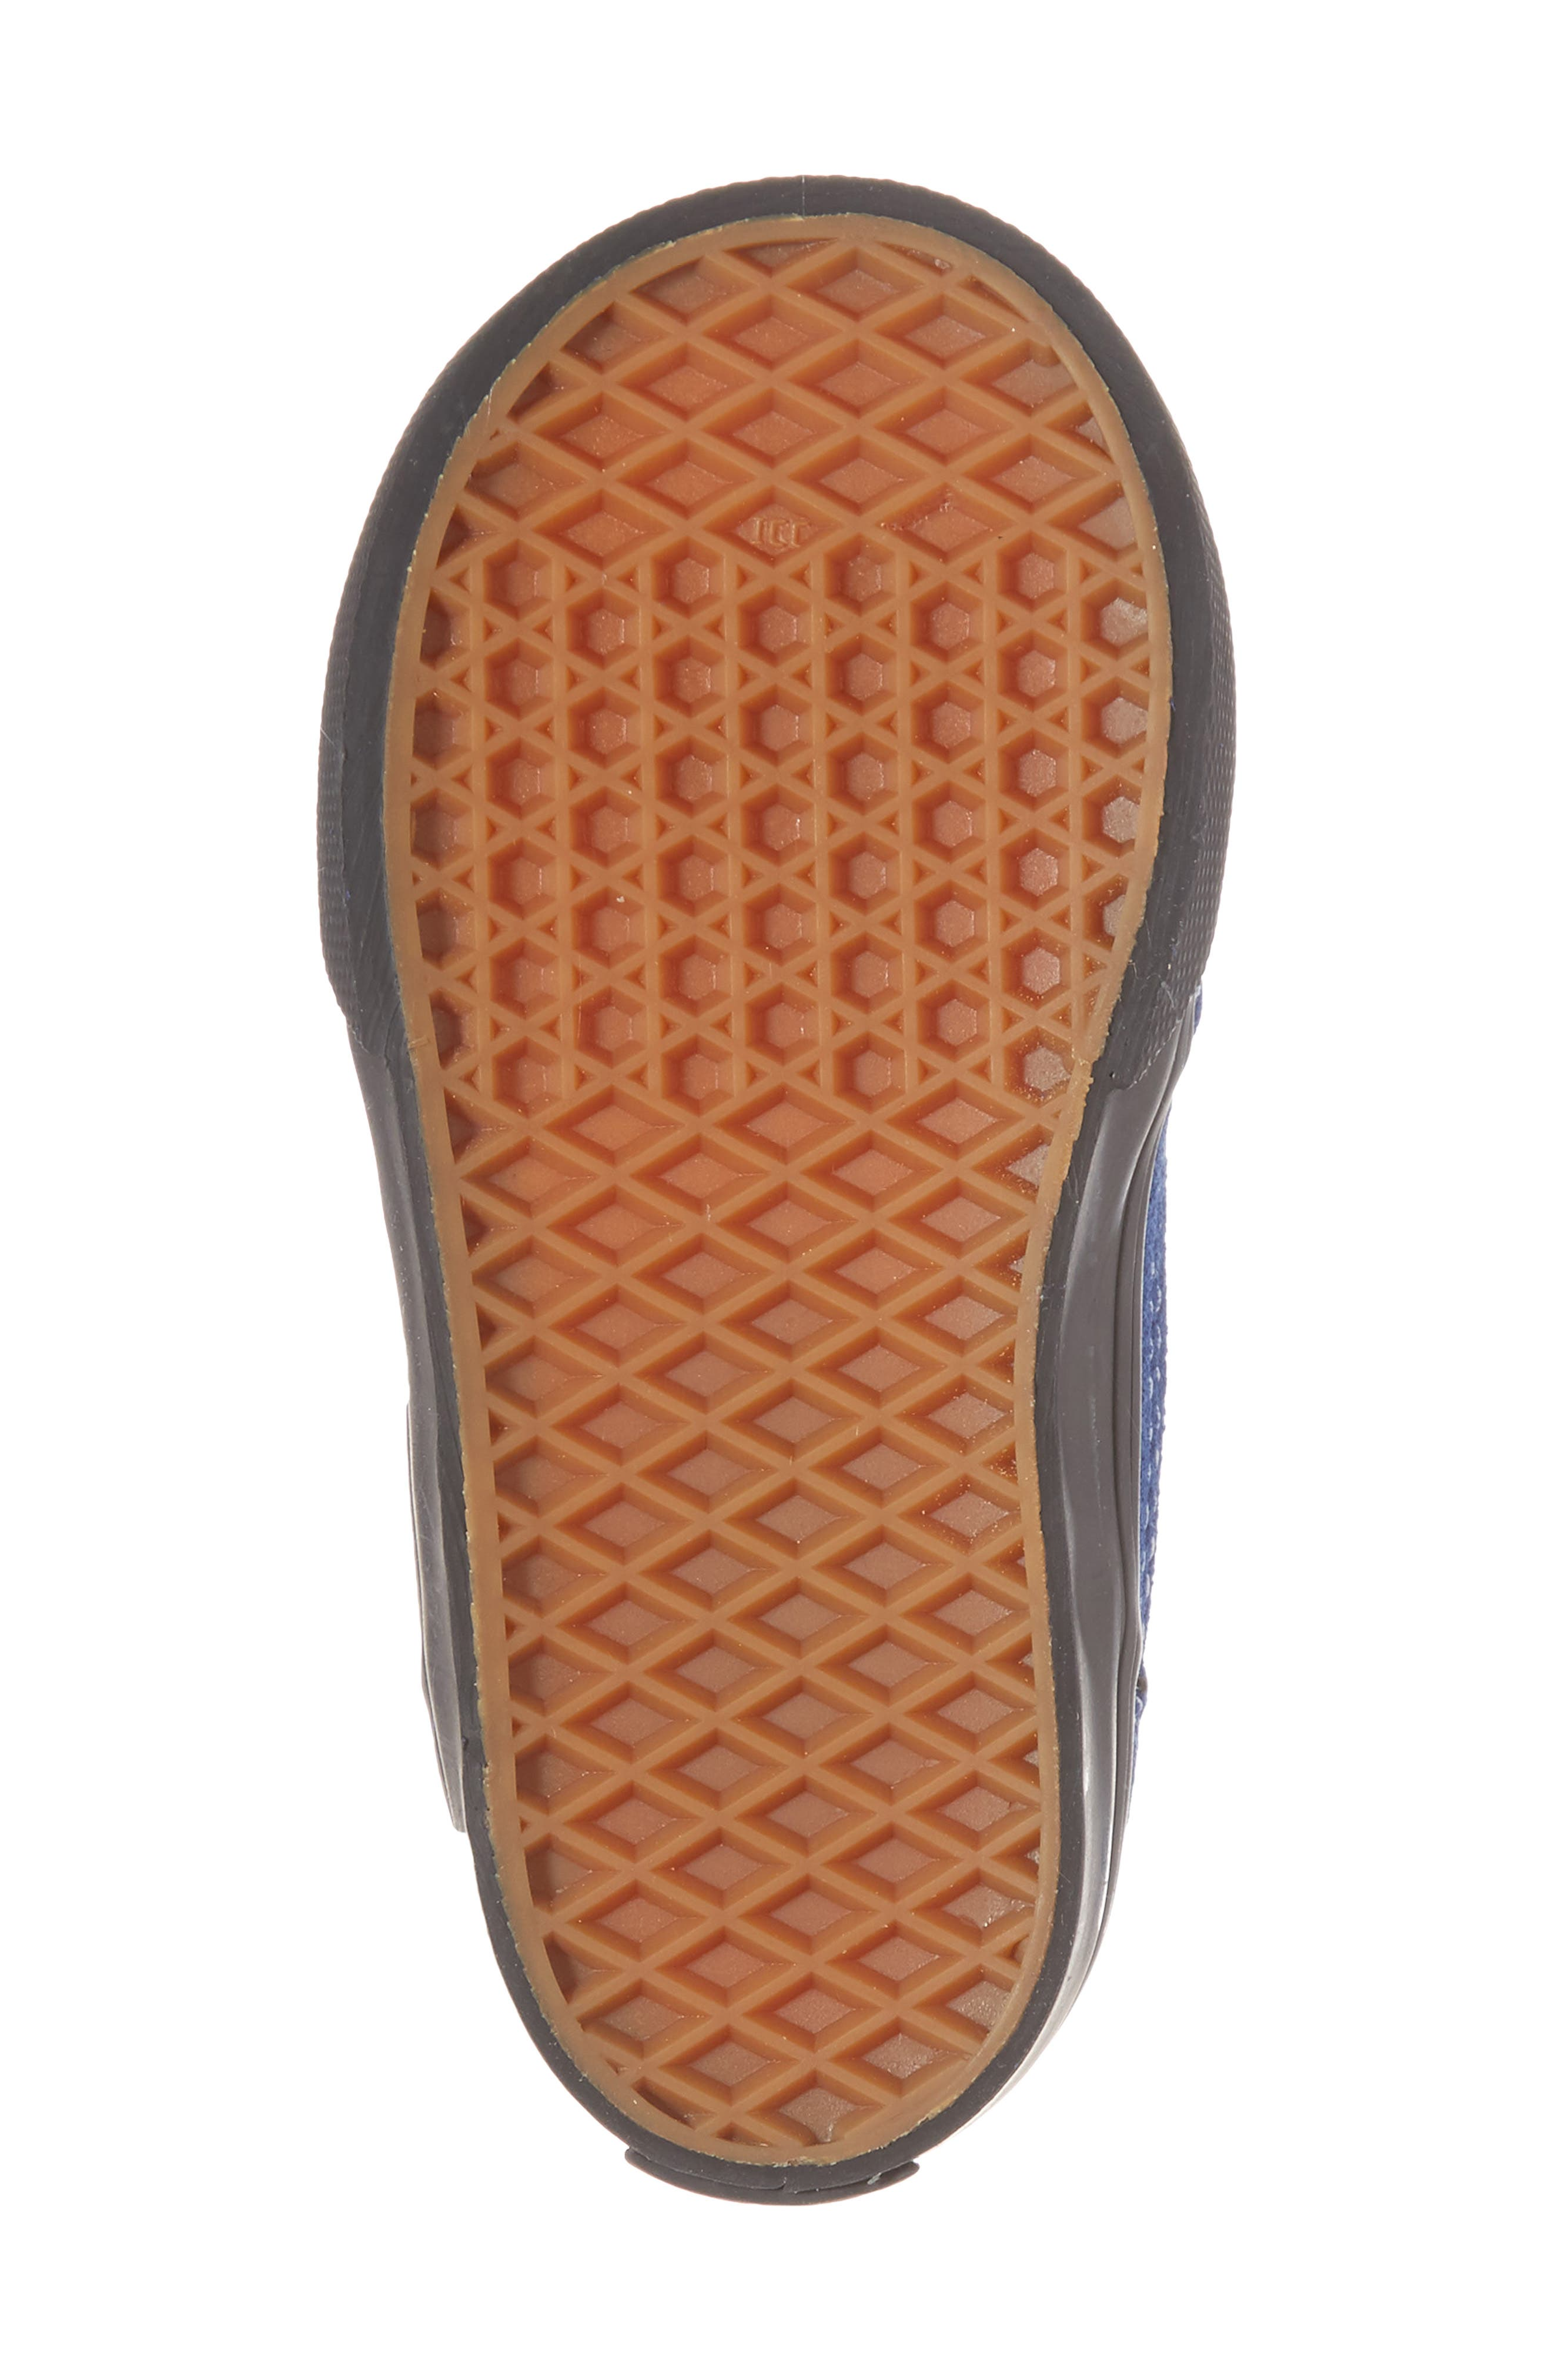 Mountain Edition Mid Top Sneaker,                             Alternate thumbnail 6, color,                             Blue/ Black